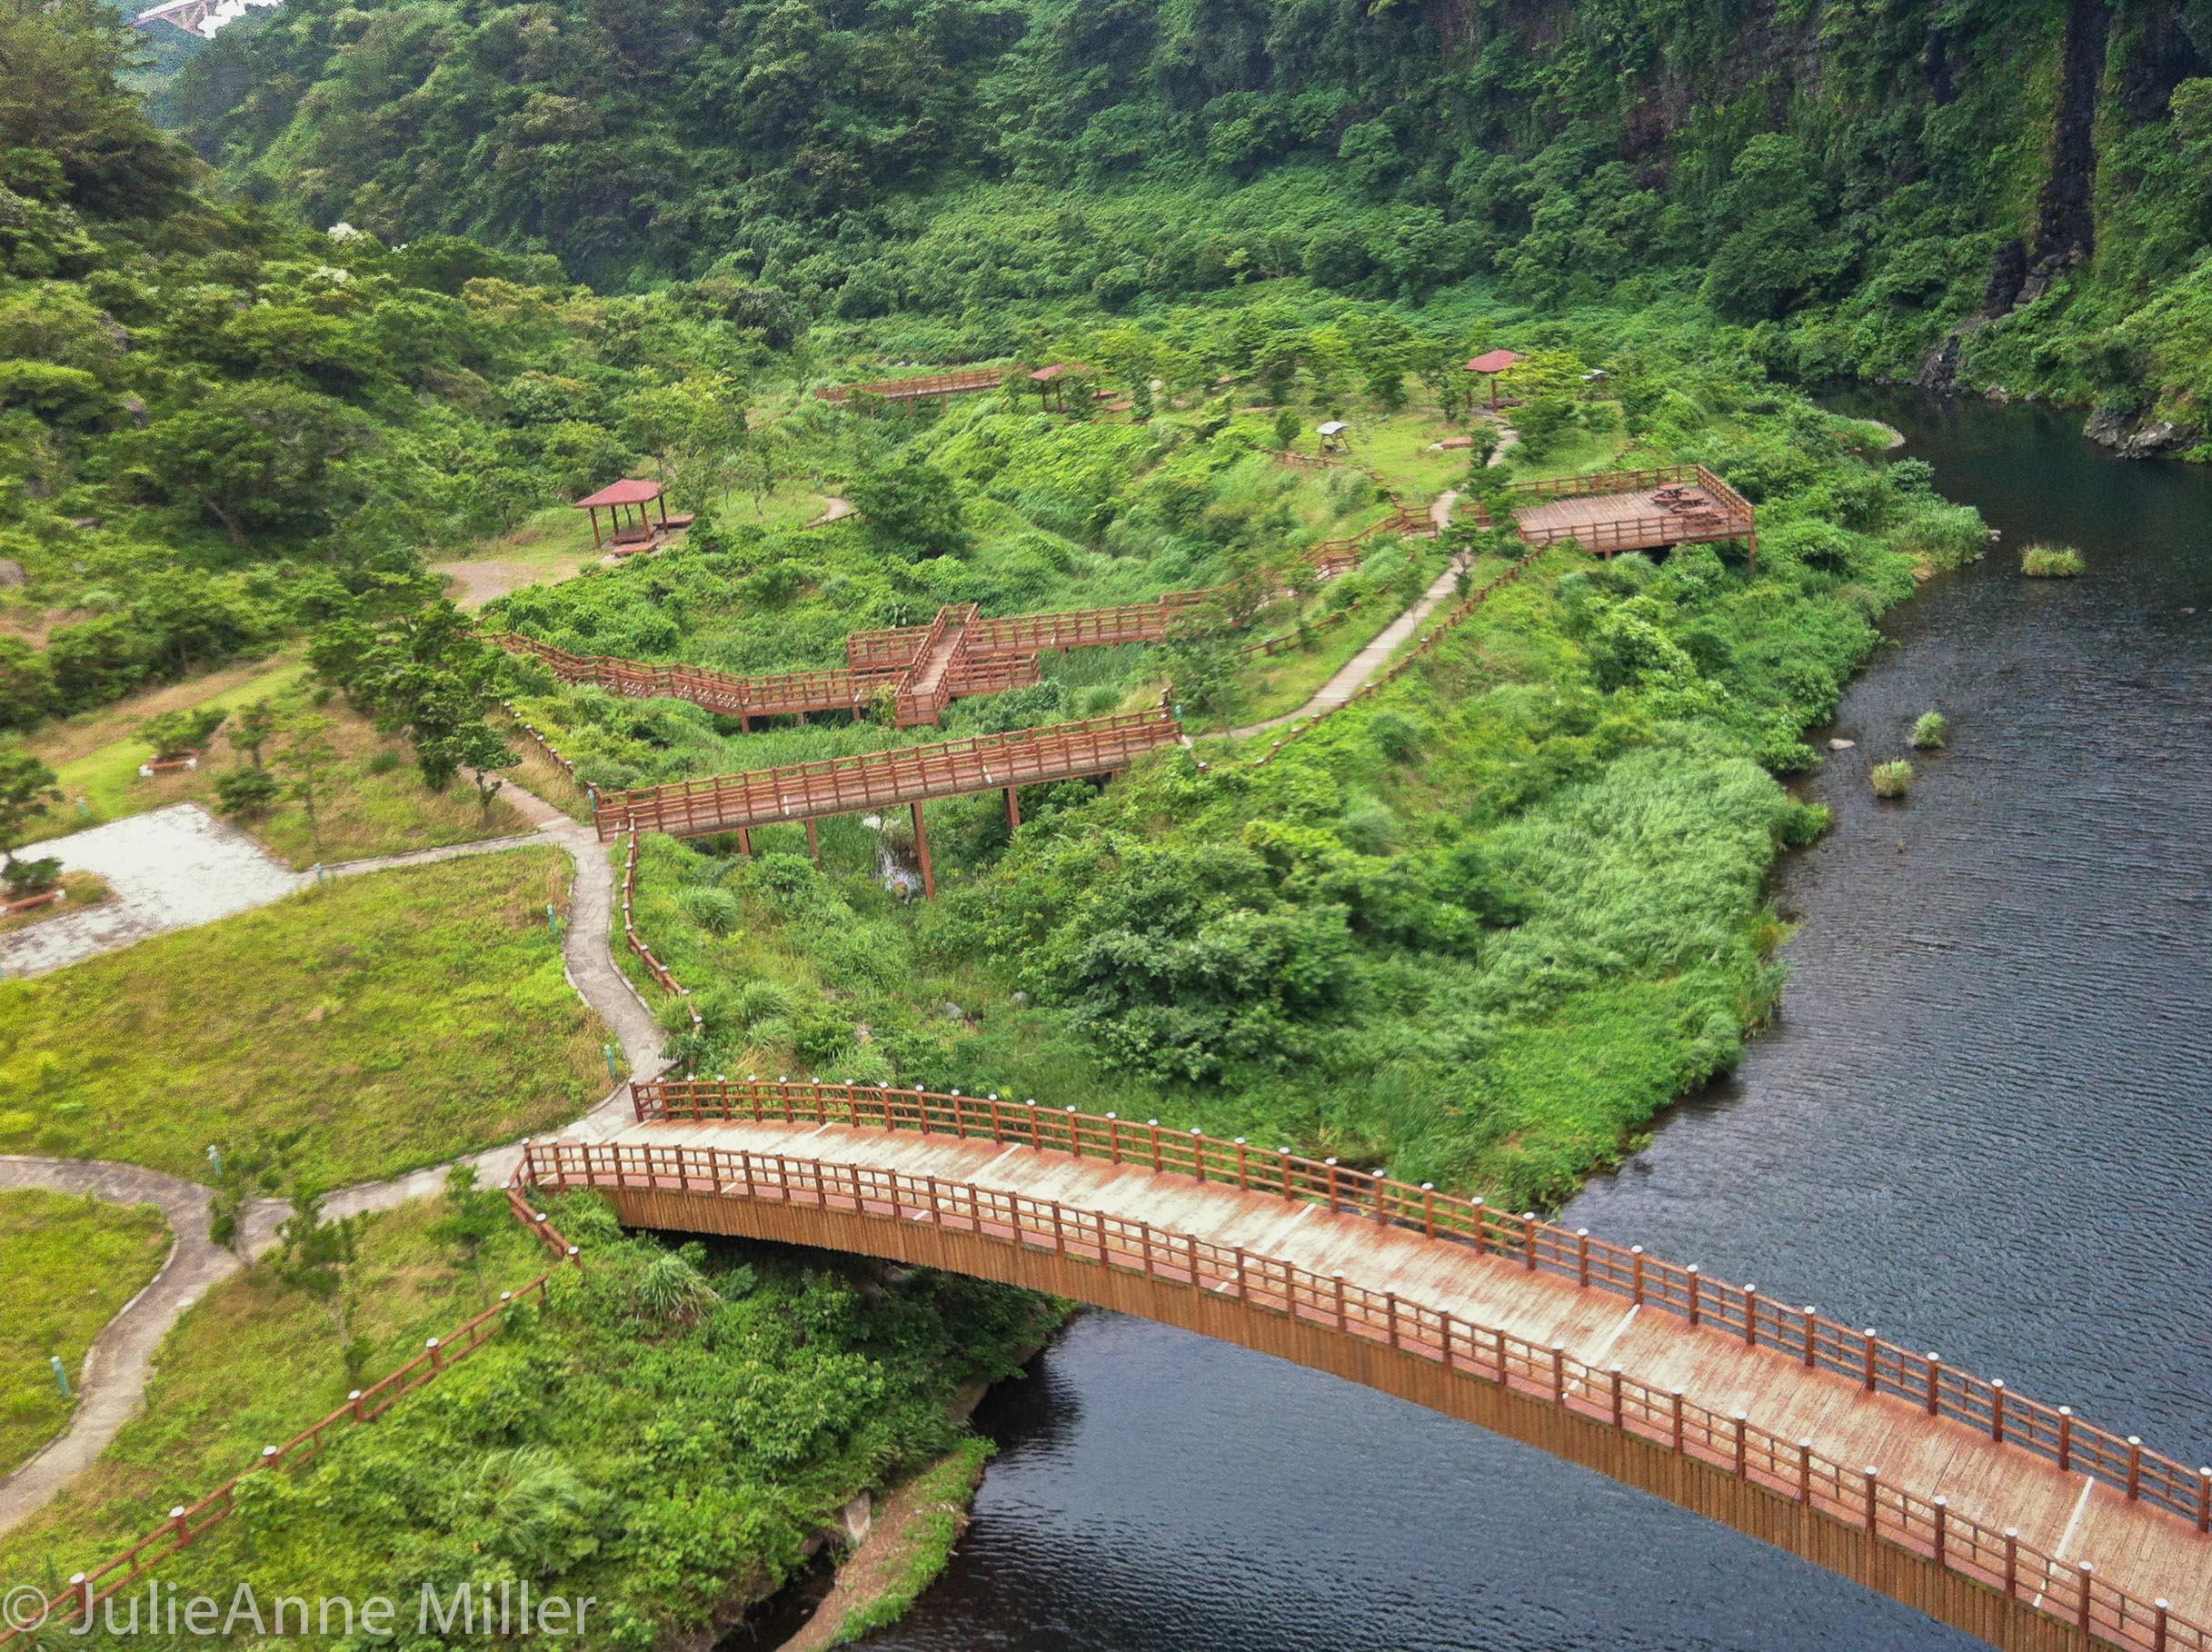 Geolmae Eco Park (걸매생태공원), Jeju Island